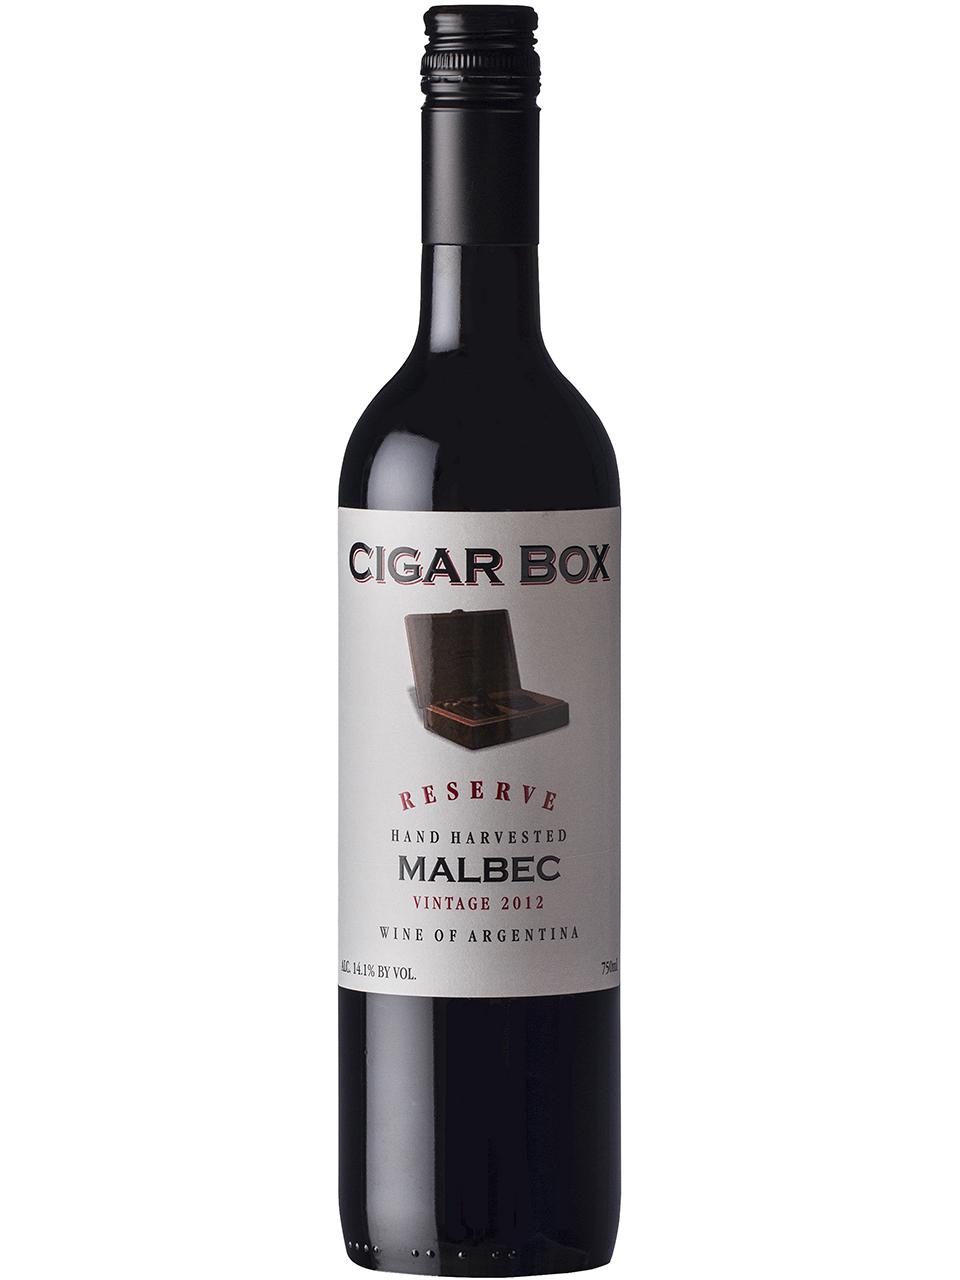 Cigar Box Malbec